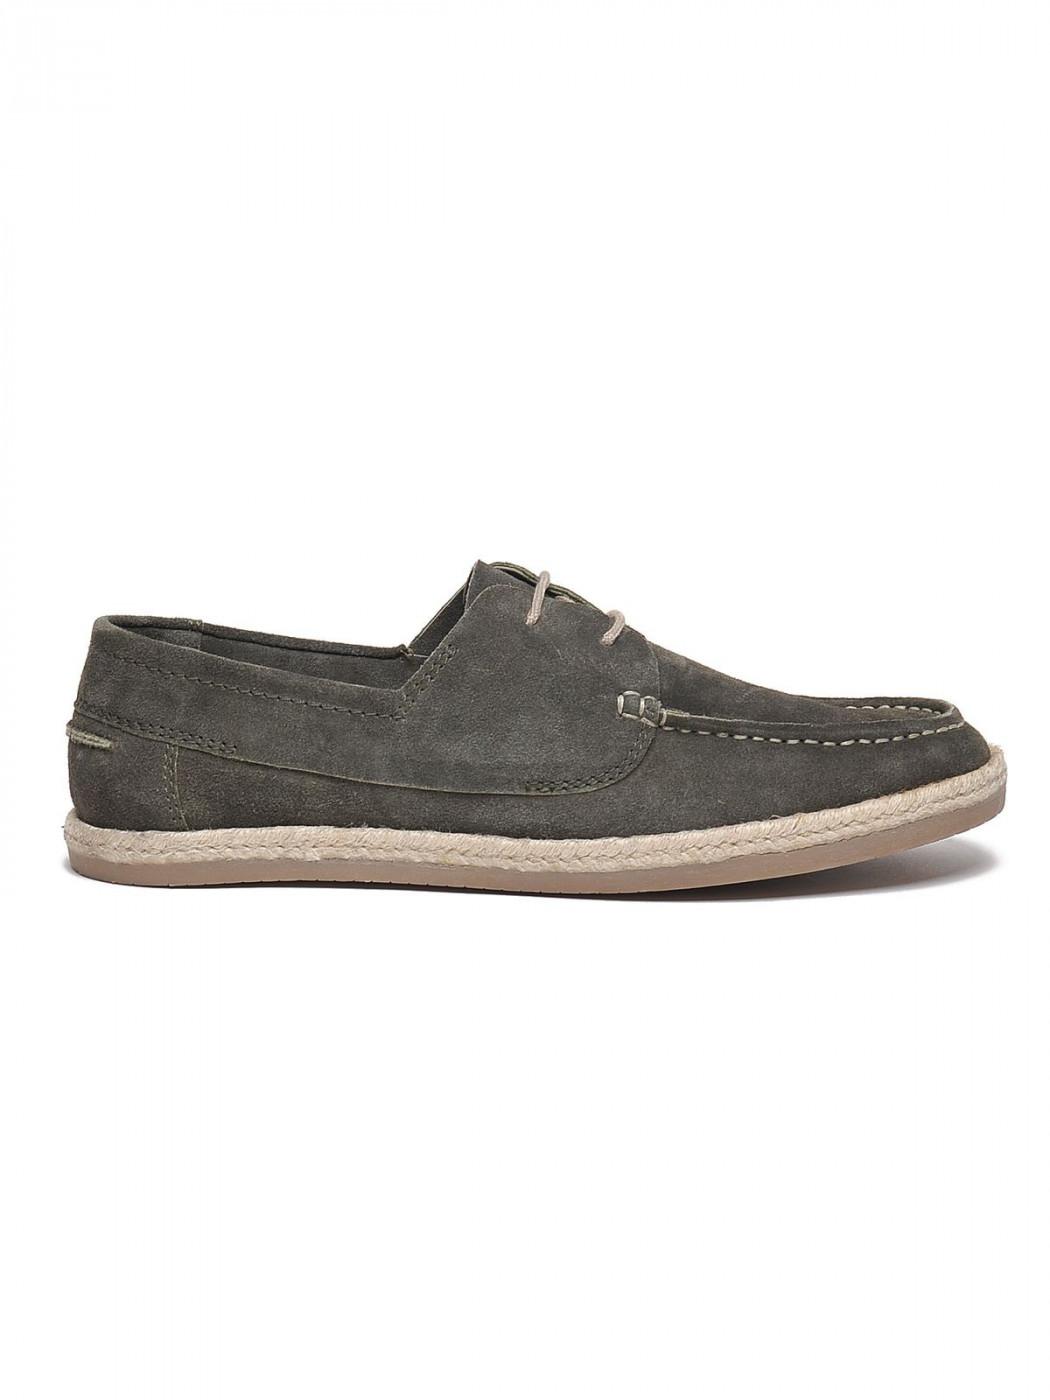 Men's loafers Top Secret Suede